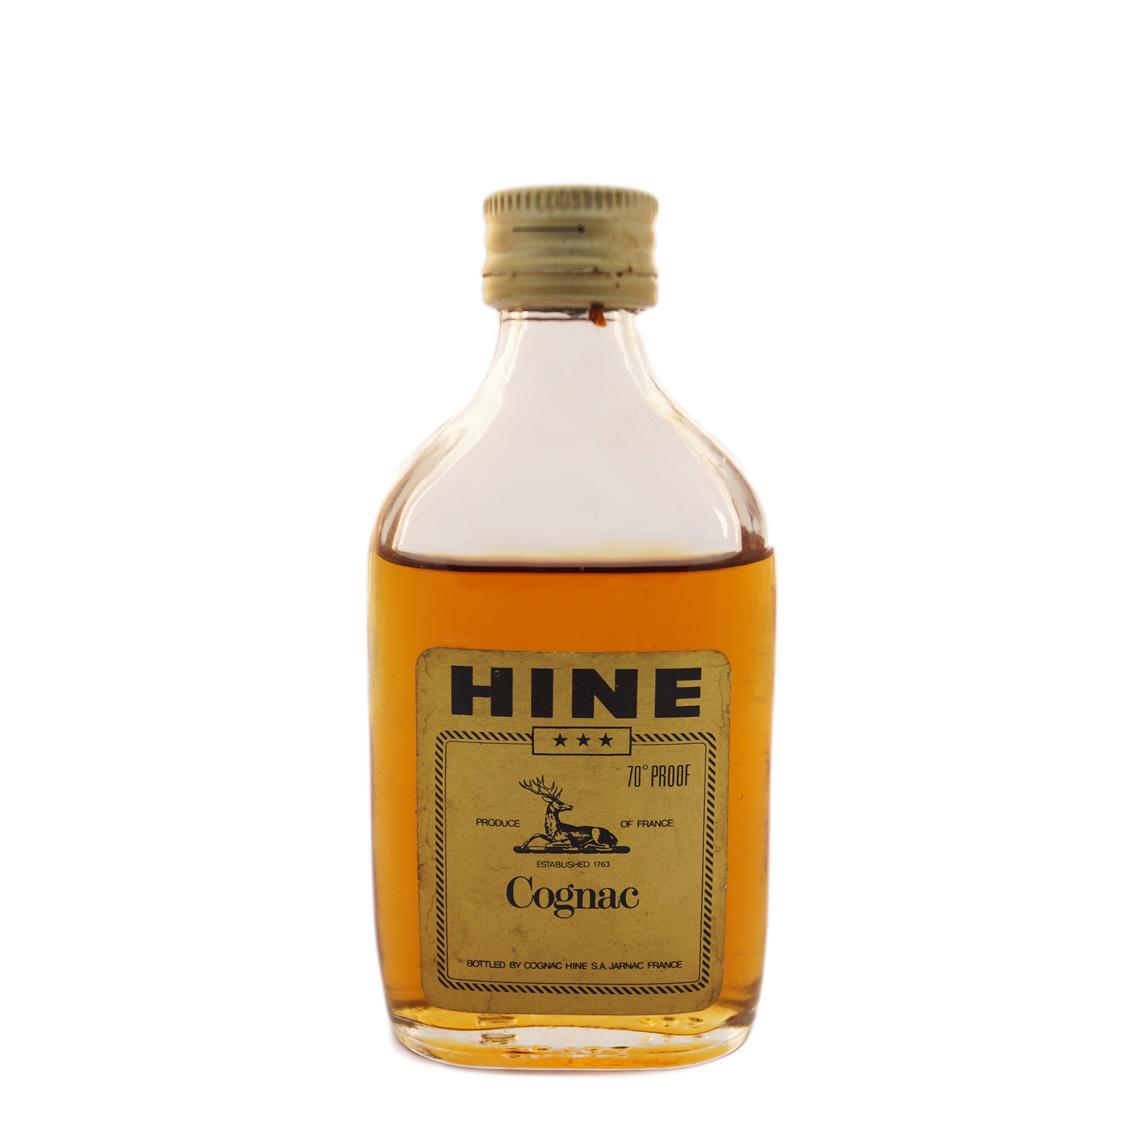 COGNAC-HINE-3-4